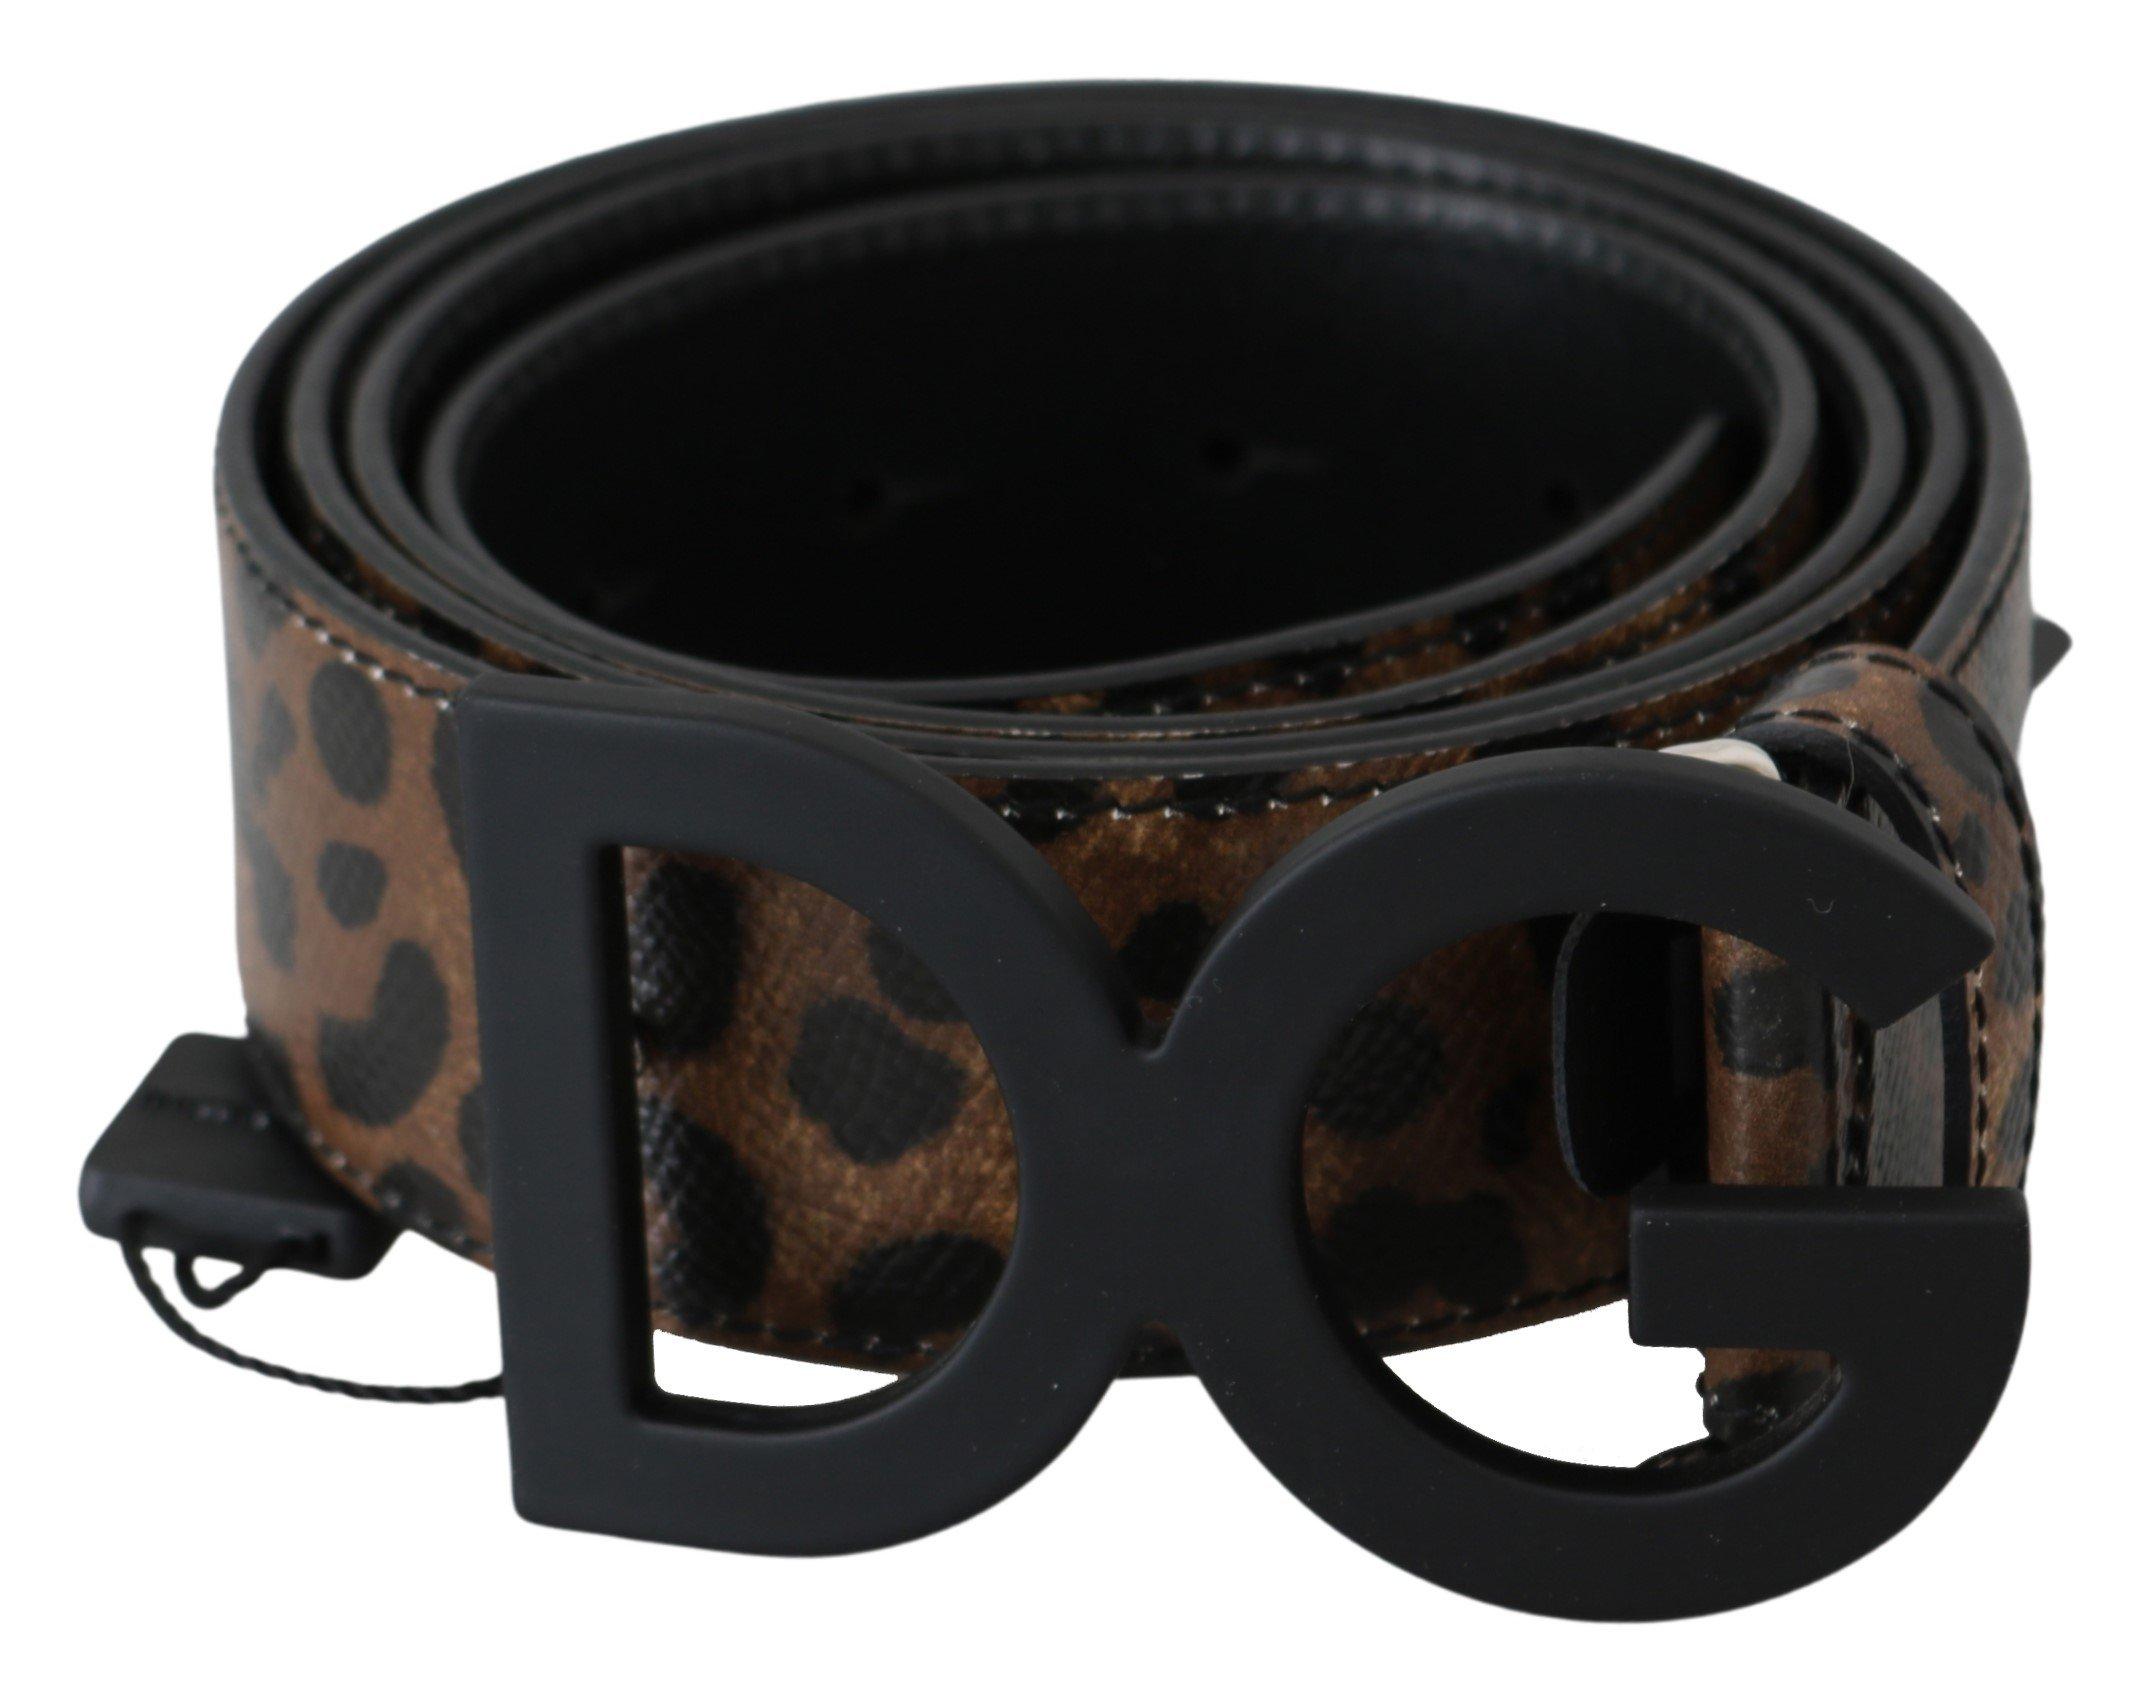 Dolce & Gabbana Men's Leopard Leather DG Buckle Belt Black BEL60669 - 105 cm / 42 Inches